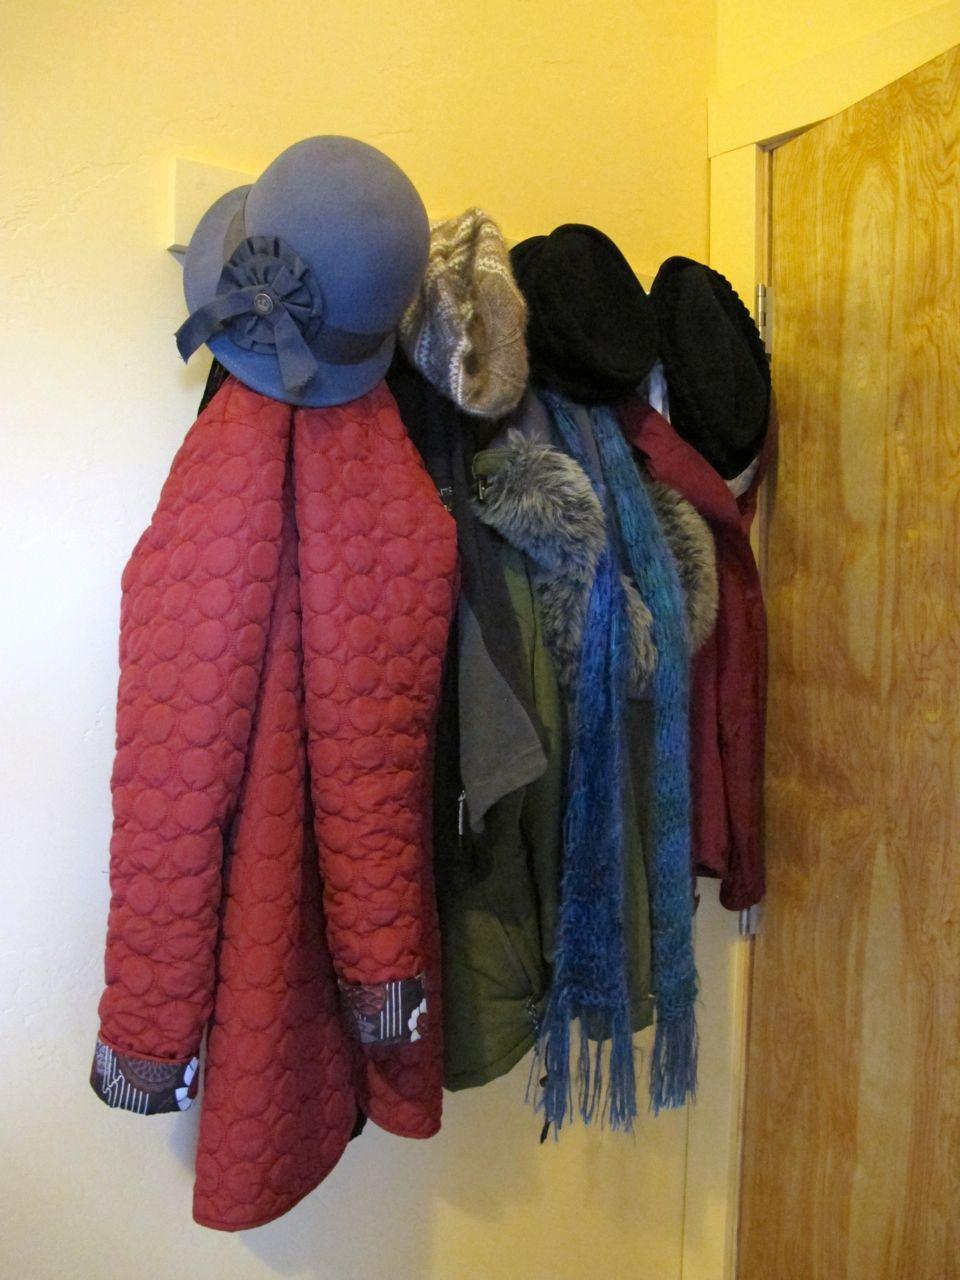 My brand-new coat rack, already full.